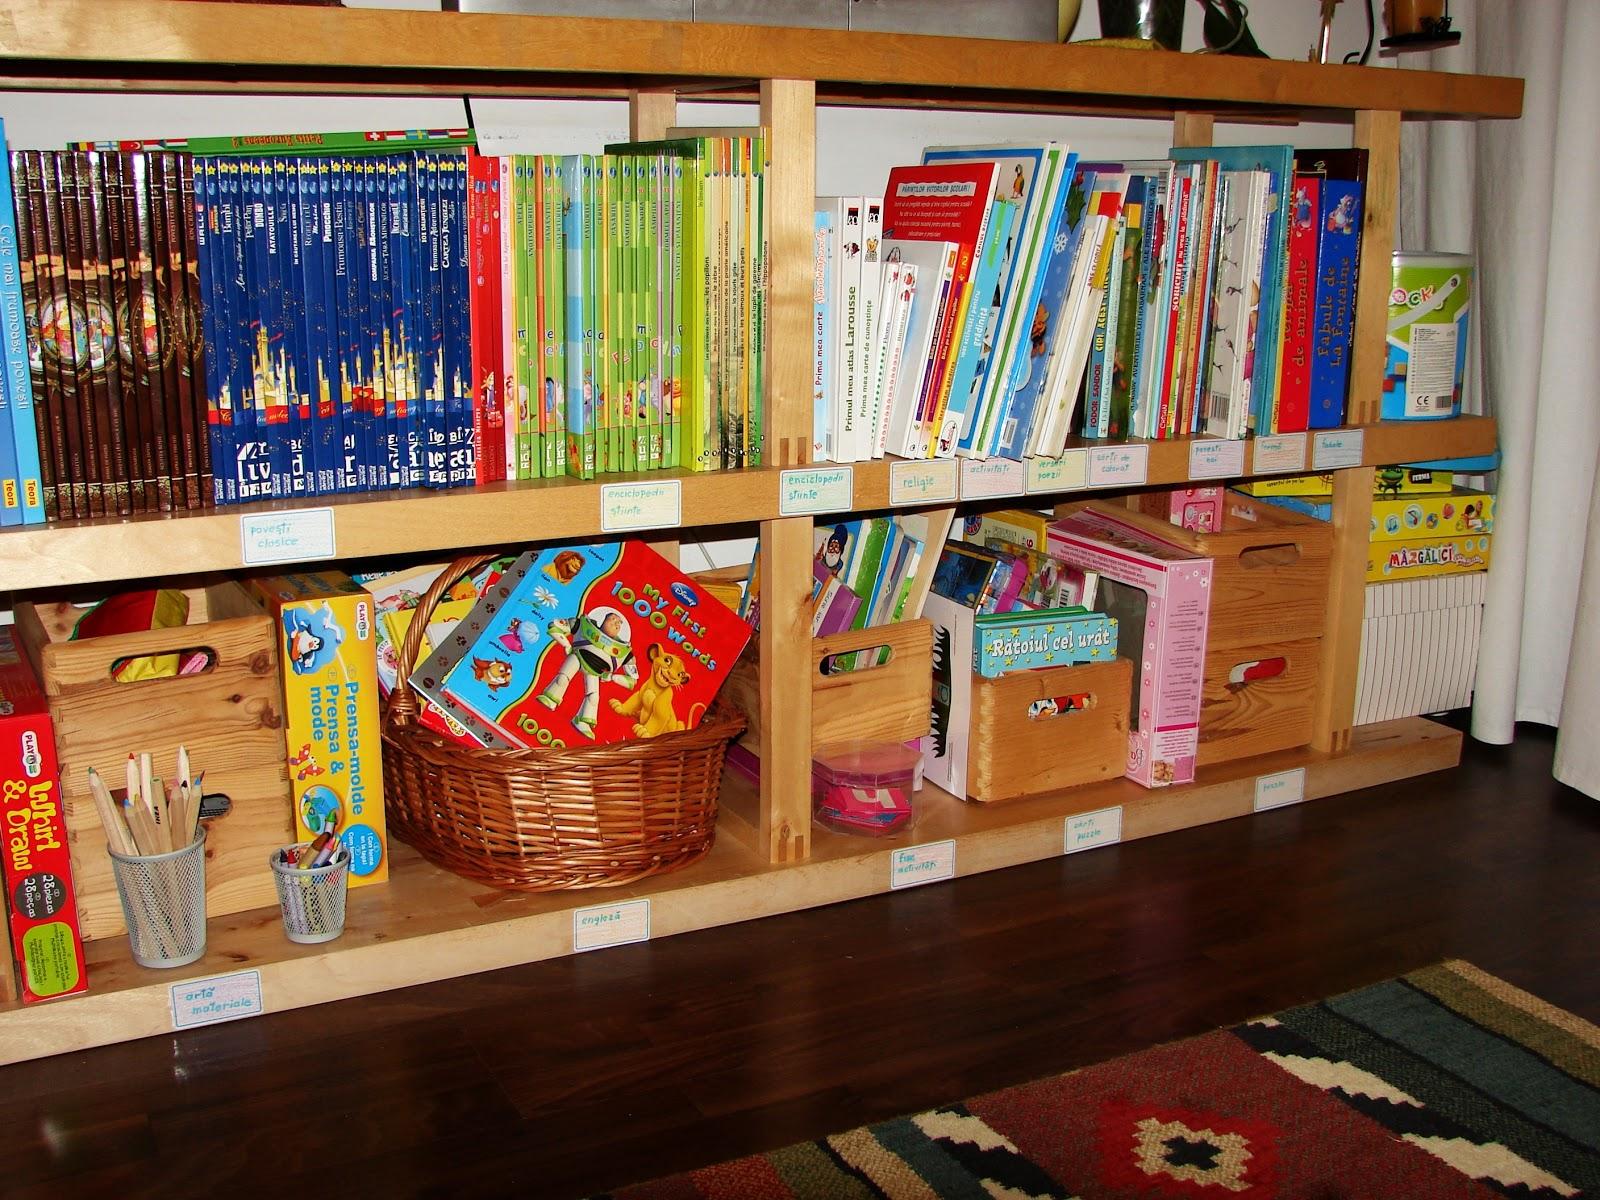 Amenajare Camera Montessori : Copilaria sofiei: cum amenajam spatiul de joaca la 3 ani?